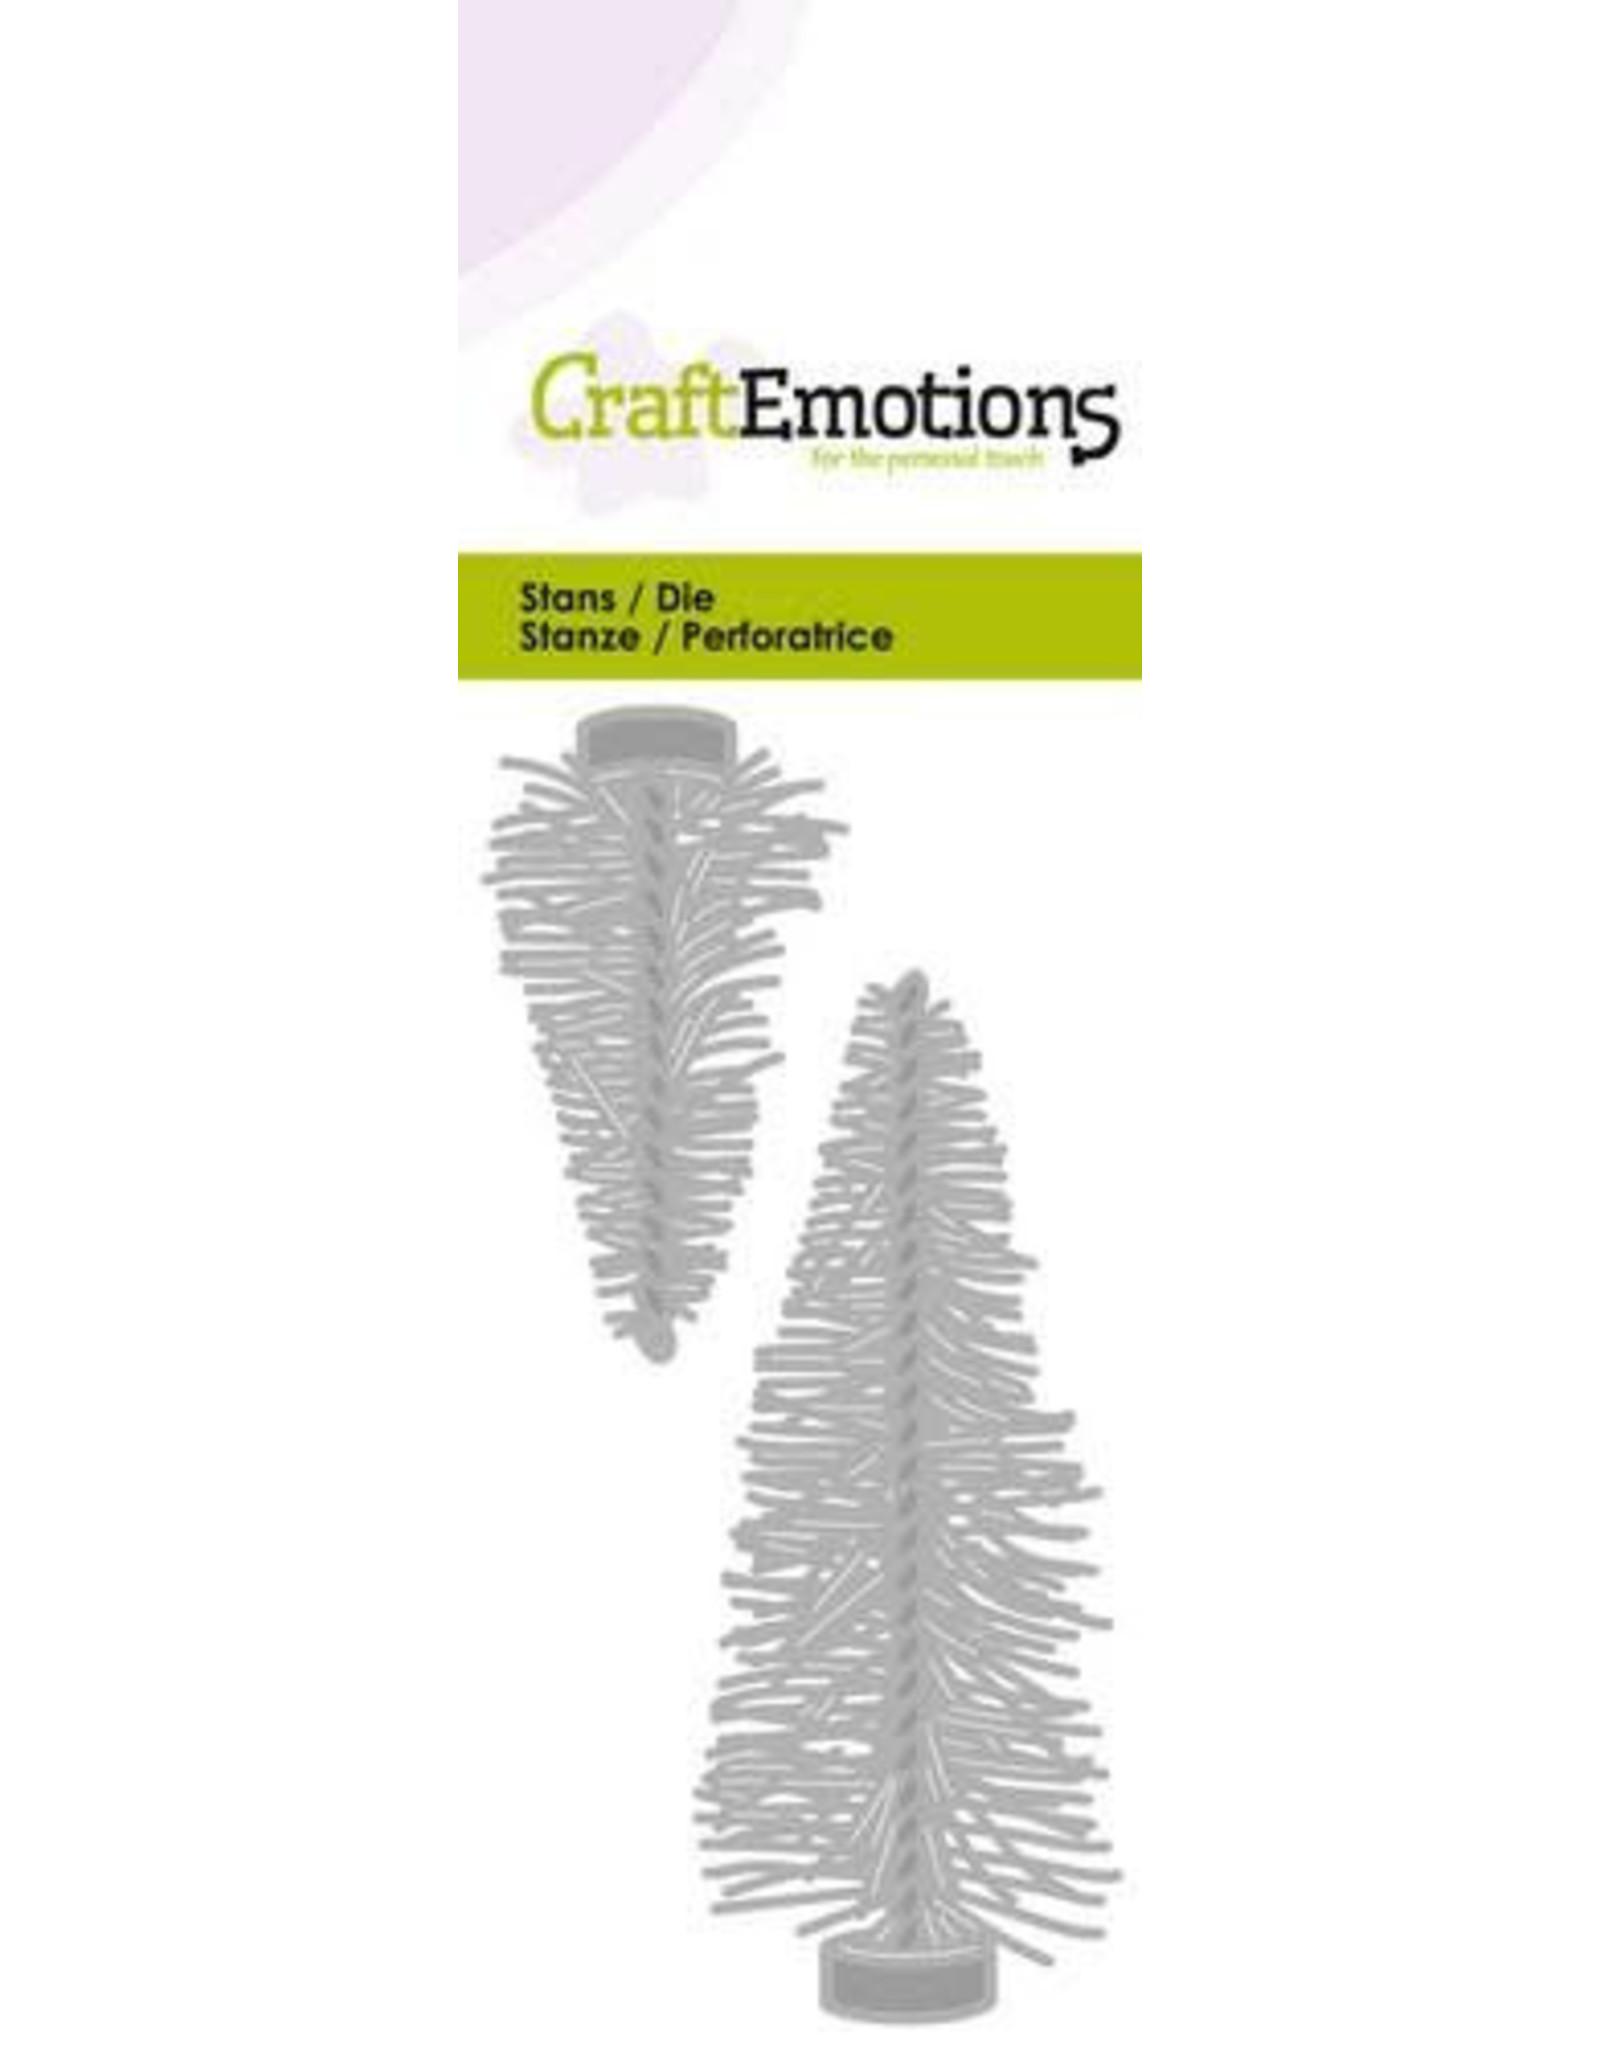 Craft Emotions CraftEmotions Die - hippe decoratie kerstboompjes Card 5x10cm